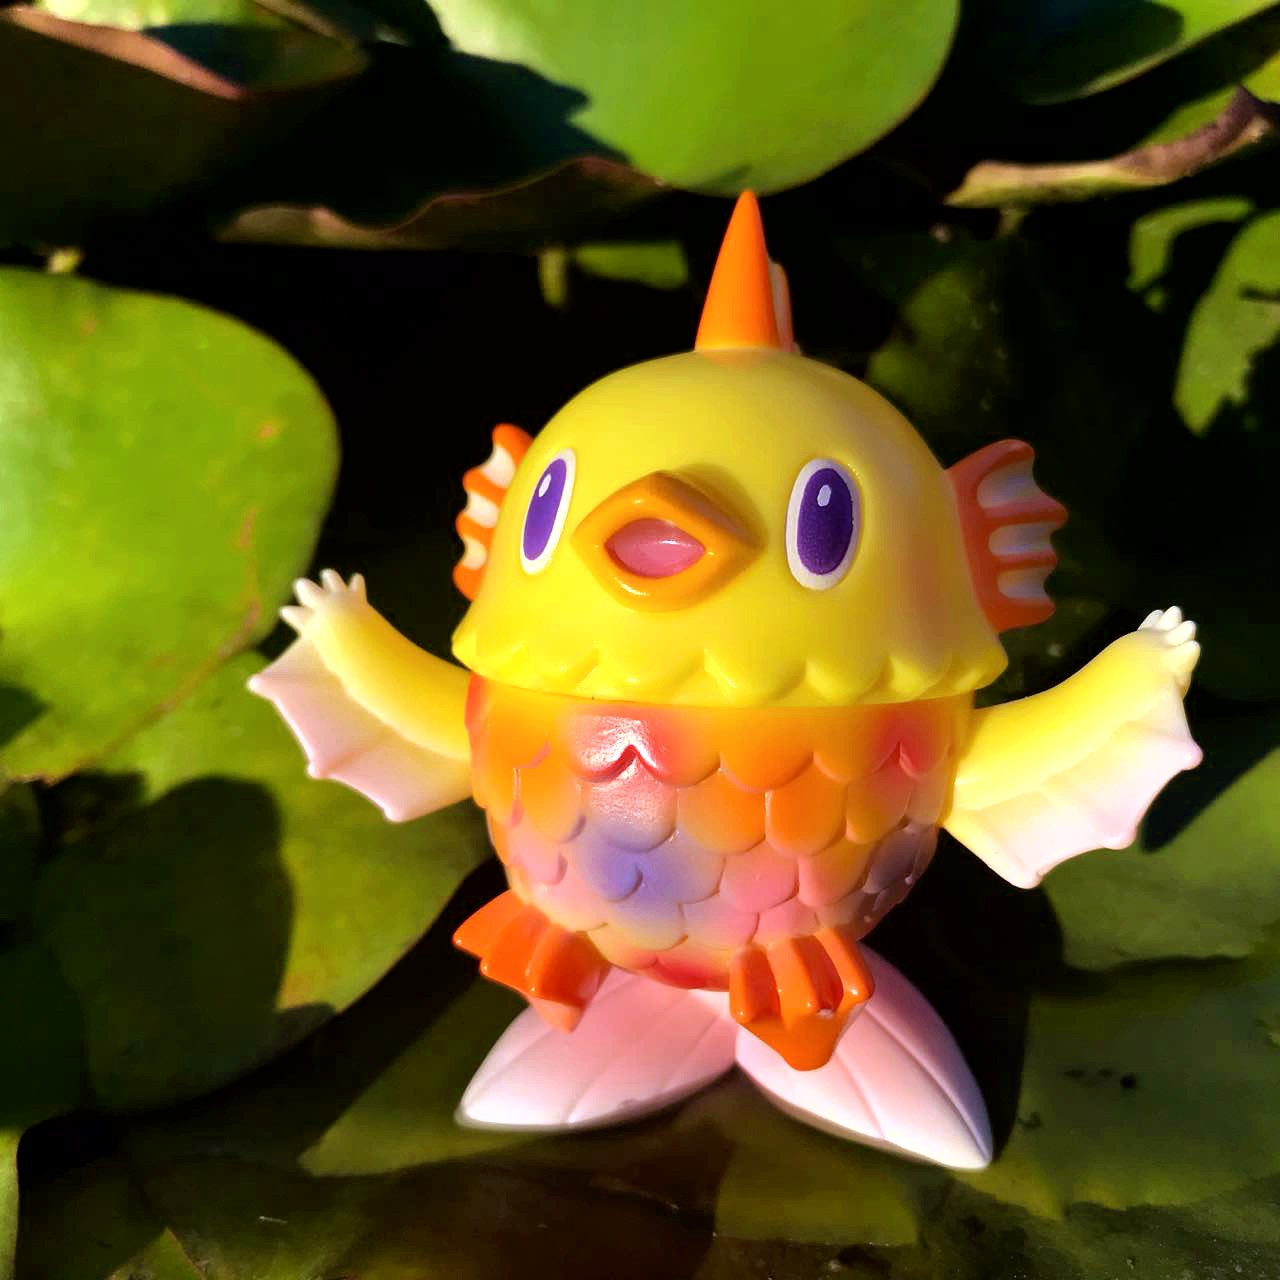 Sakanatori Hikari Bambi Art Toys SofubiSakanatori Hikari Bambi Art Toys Sofubi